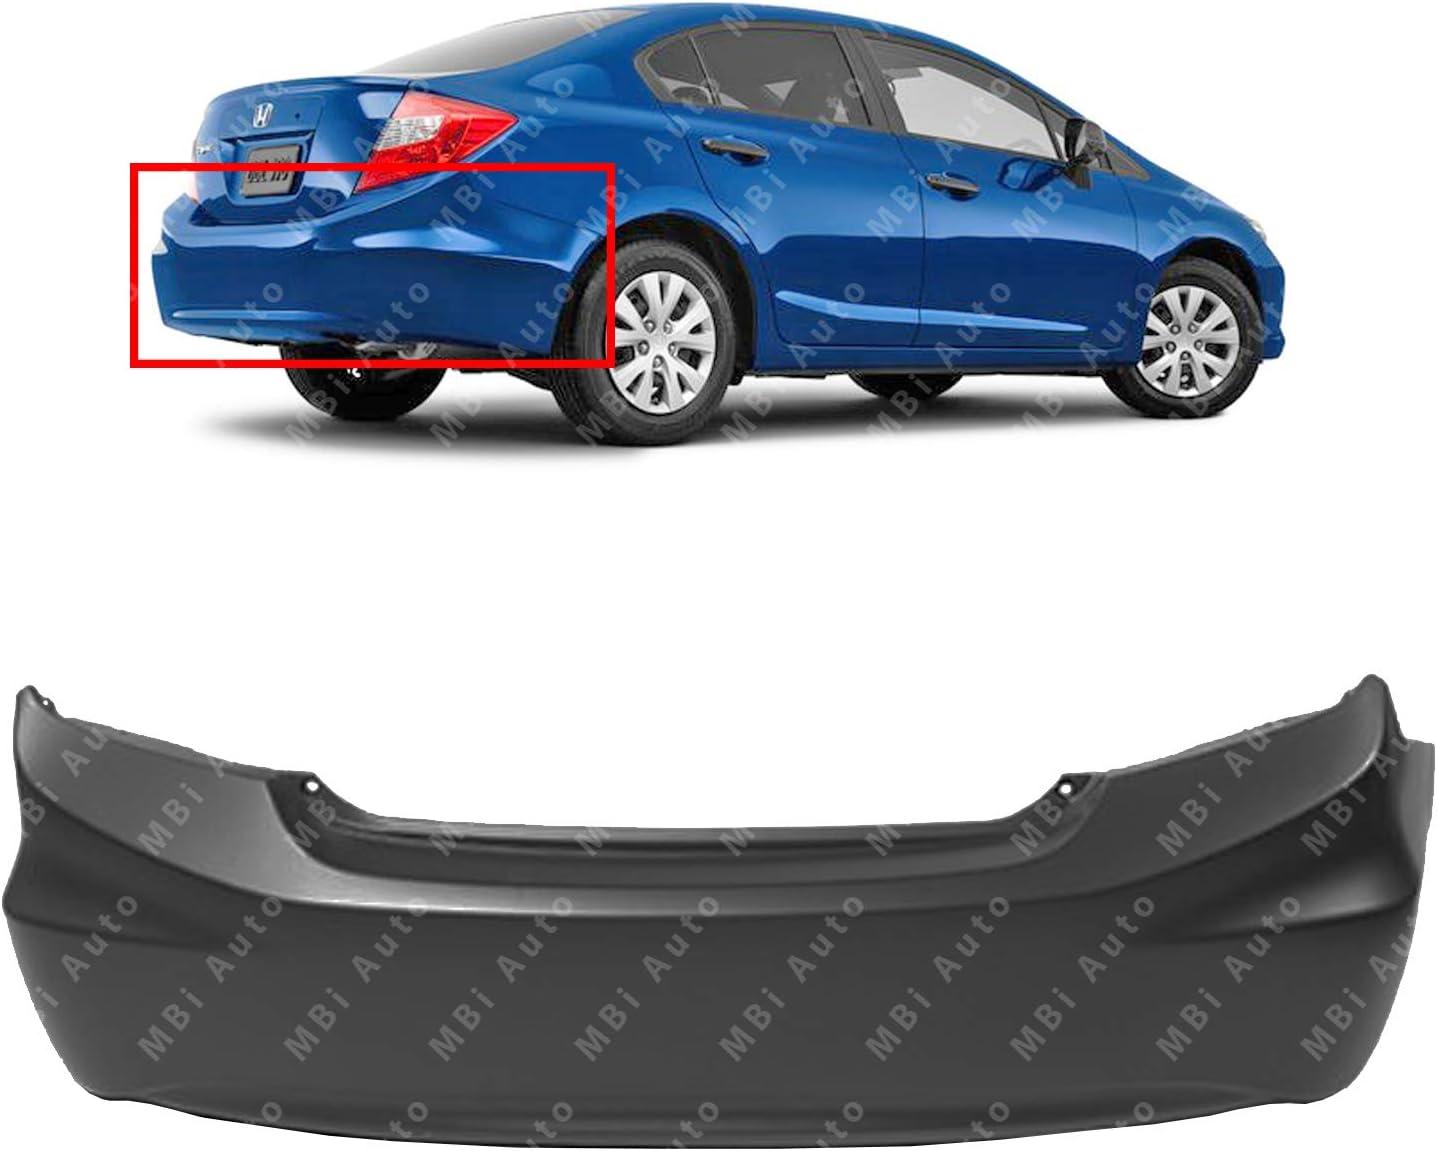 Primered HO1100272 Rear Bumper Cover for 2012 Honda Civic Sedan /& Hybrid 12 MBI AUTO